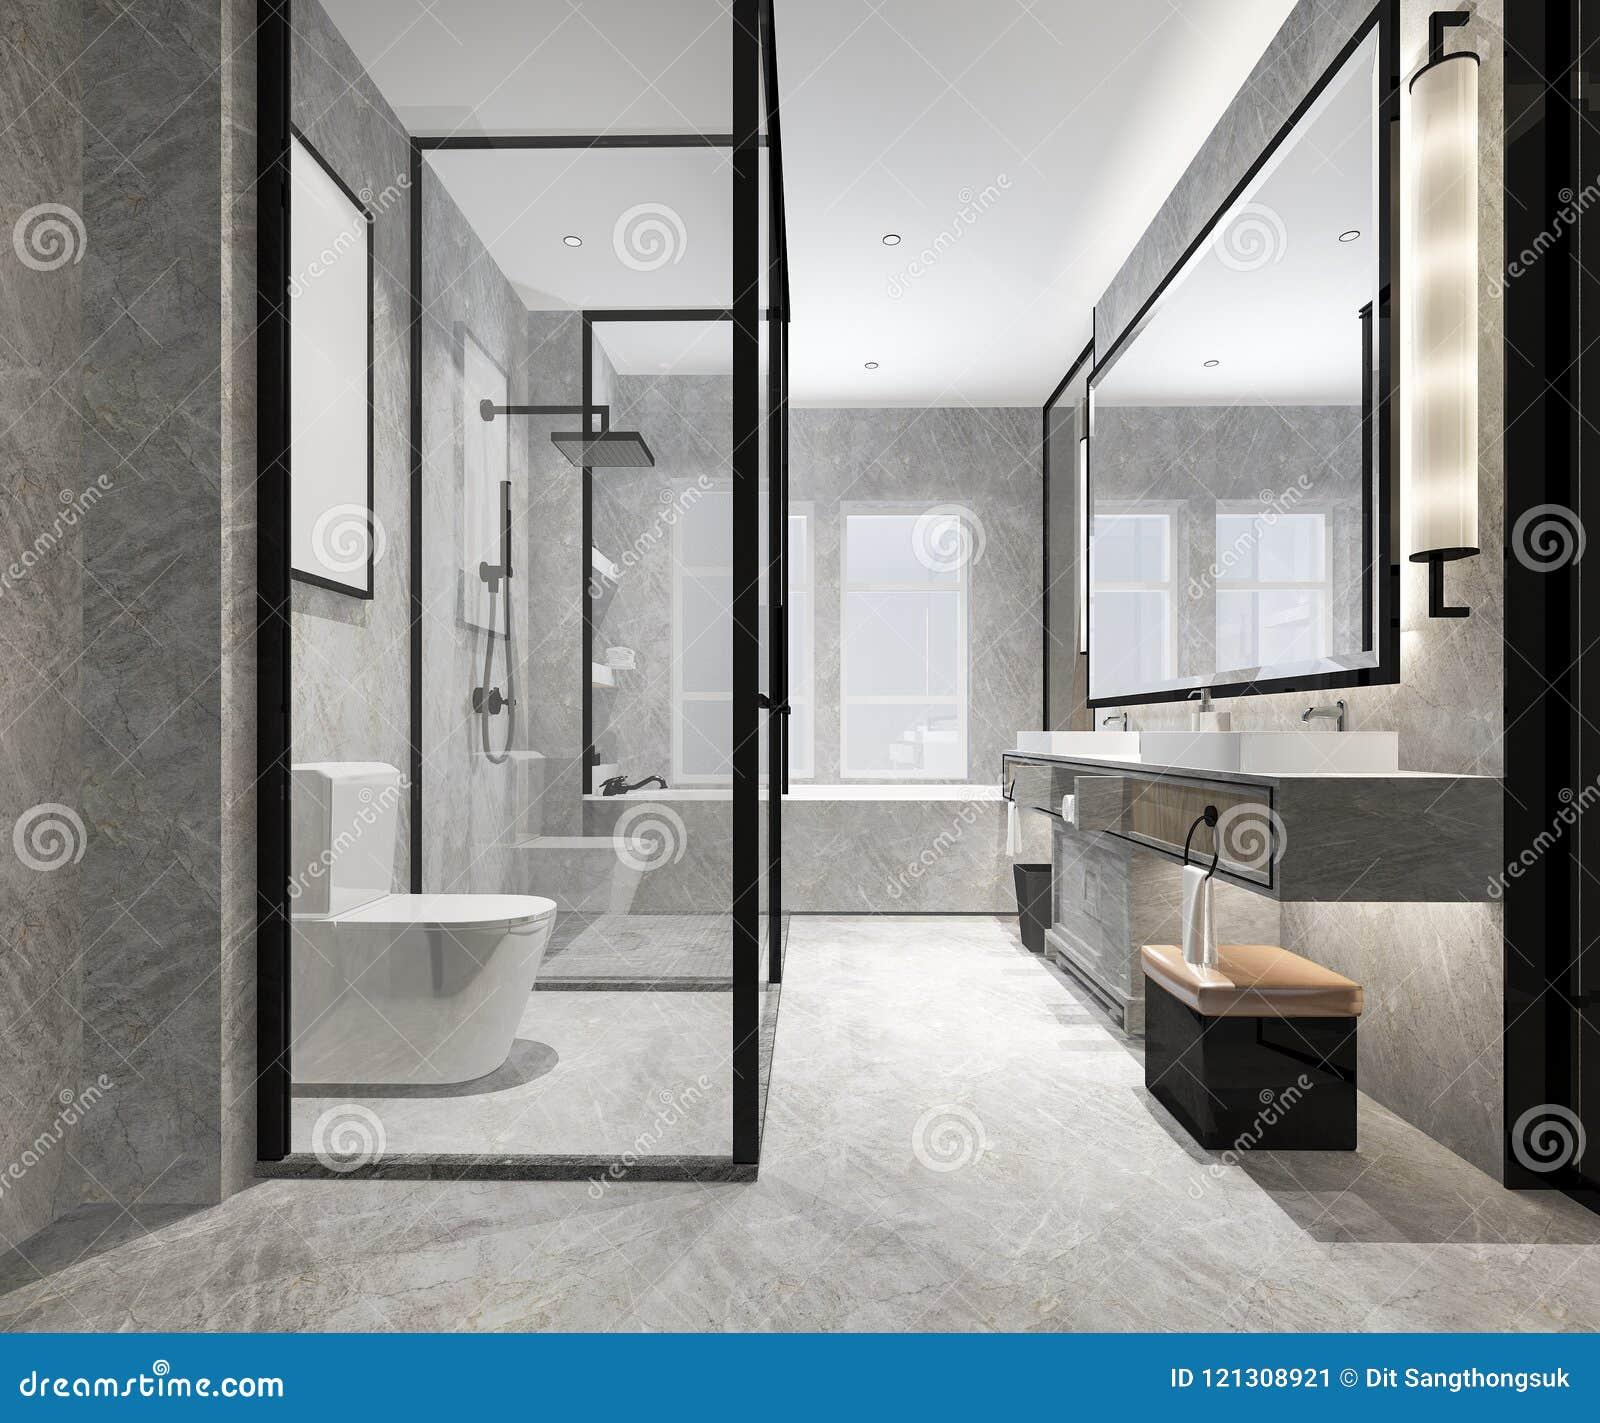 3d Rendering Luxury Modern Design Bathroom And Toilet Stock ...